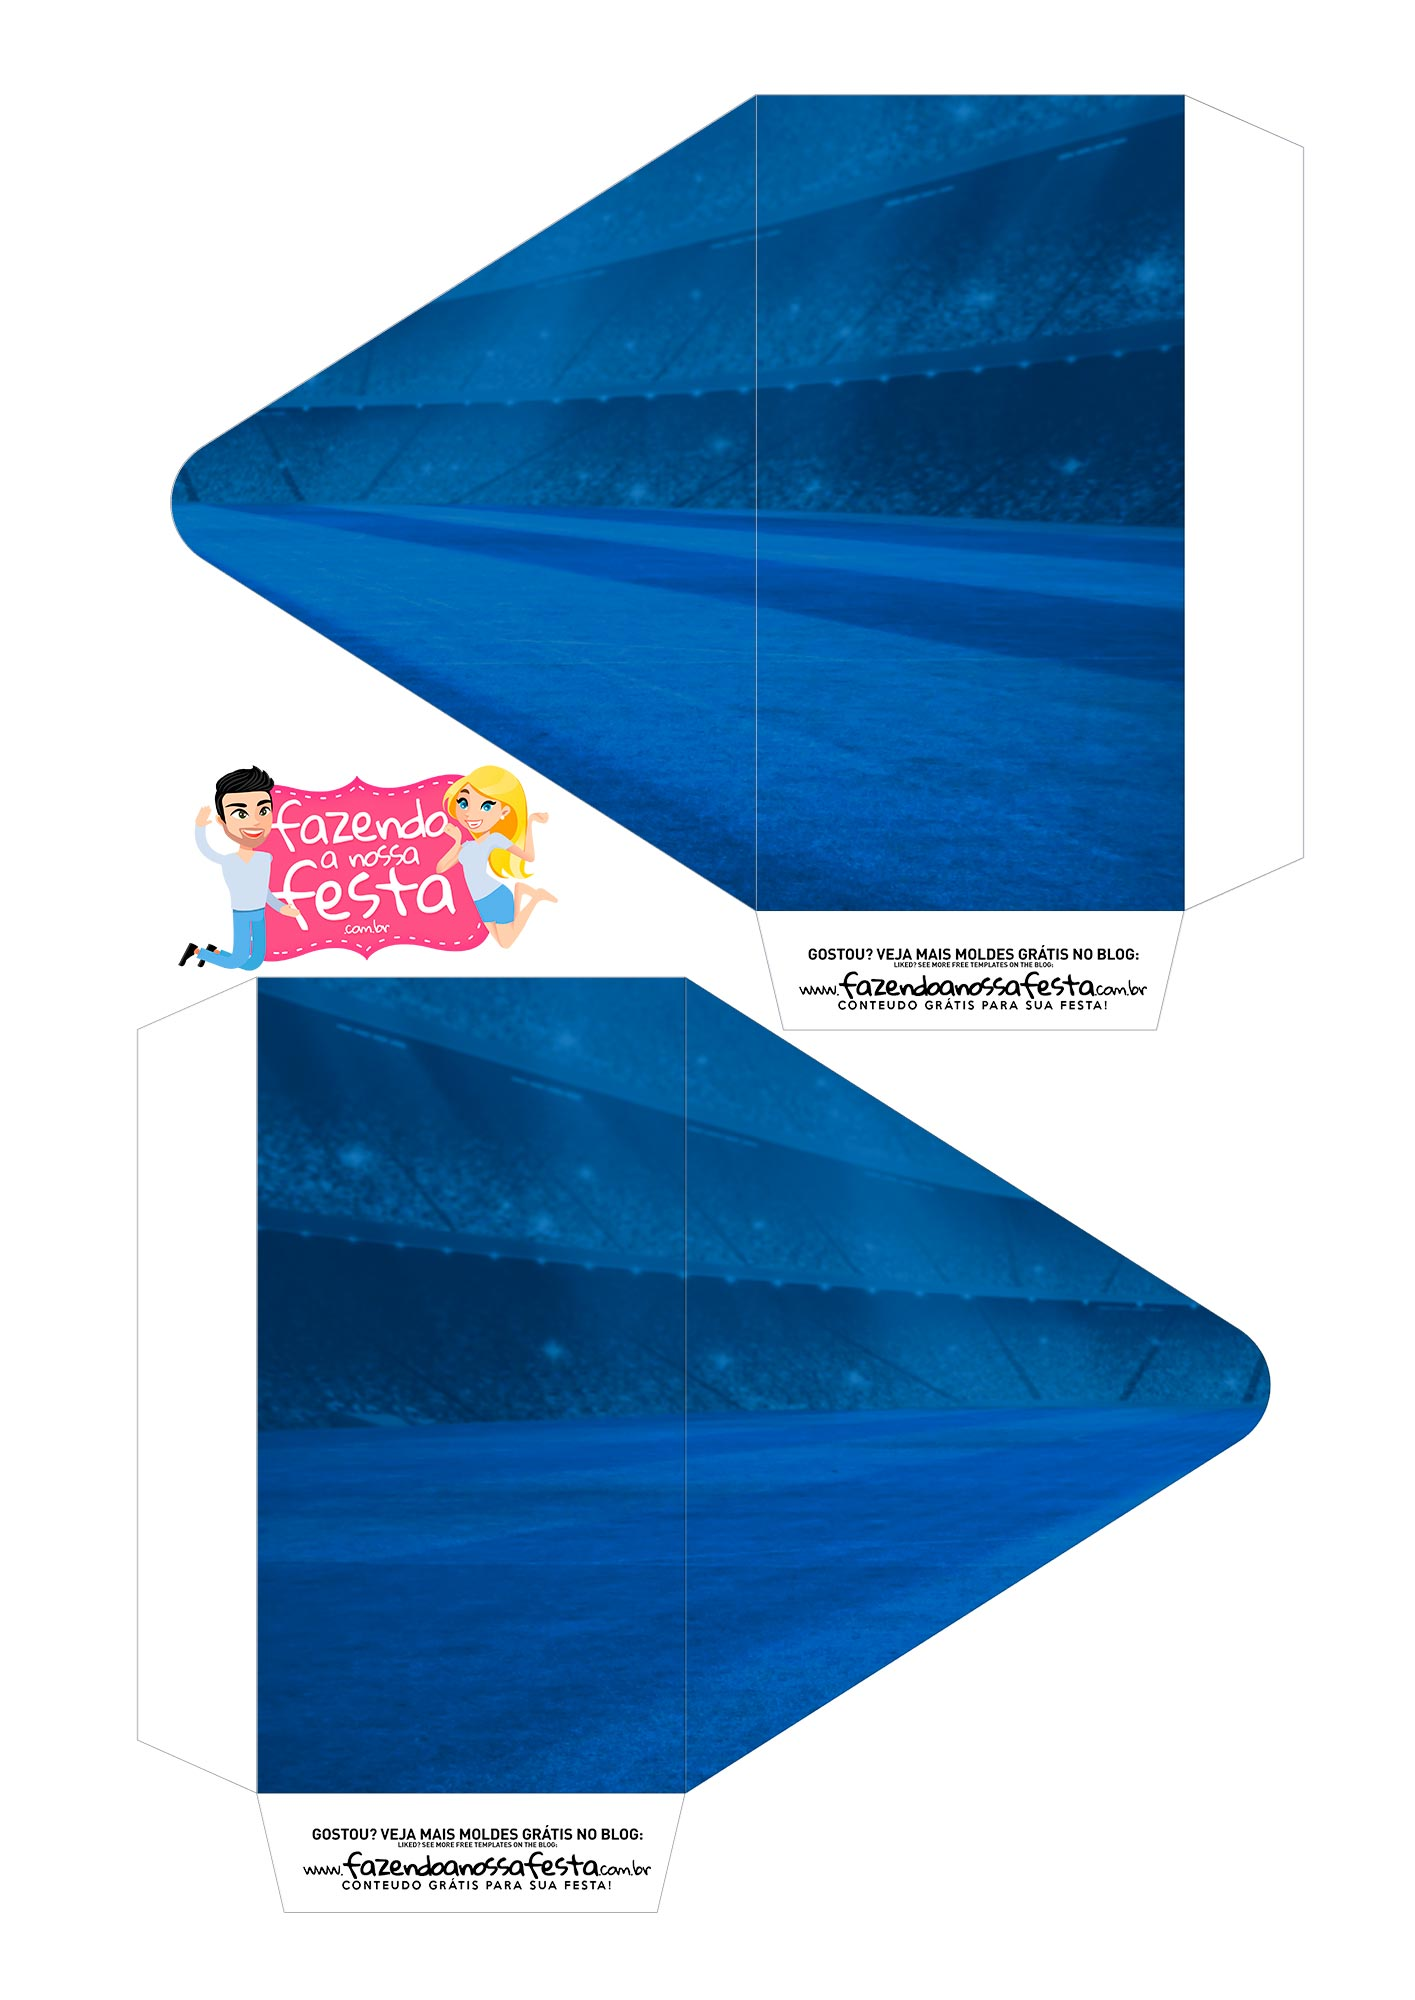 Caixa Envelope Cruzeiro 1